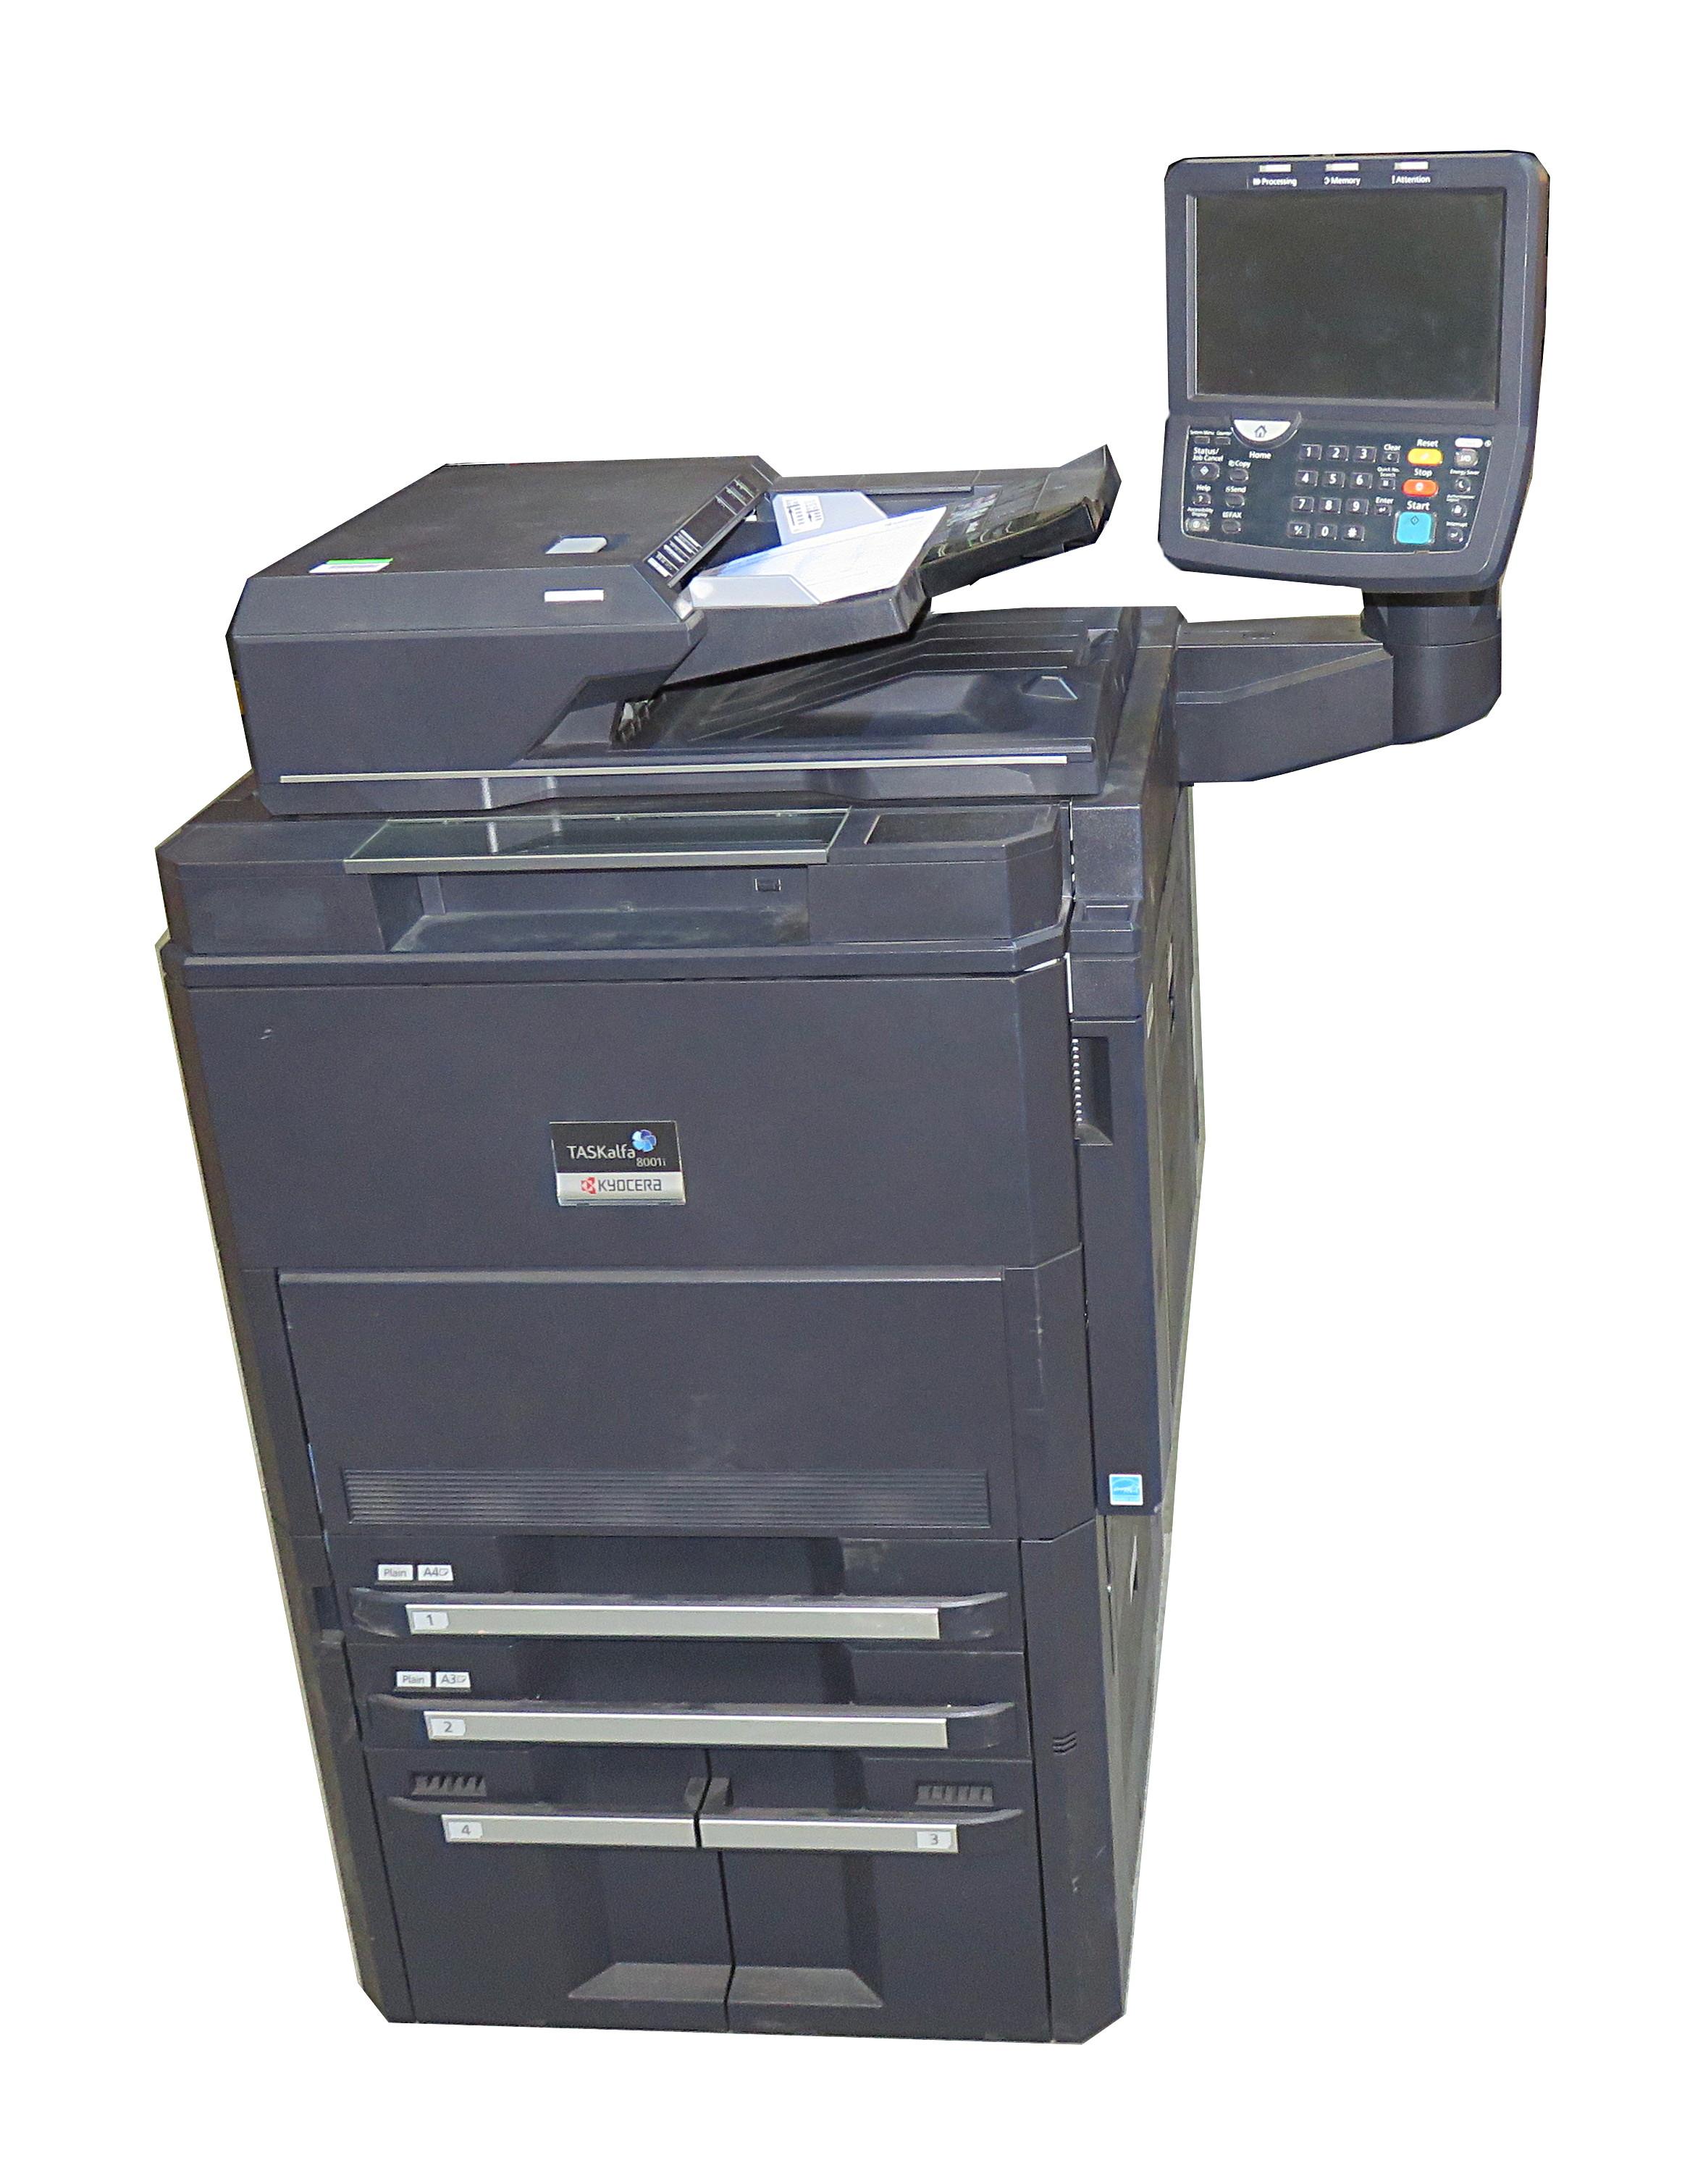 Kyocera TaskALFA 8001i Network Multifunction Copier/Scanner/Printer  L8V3Y00196